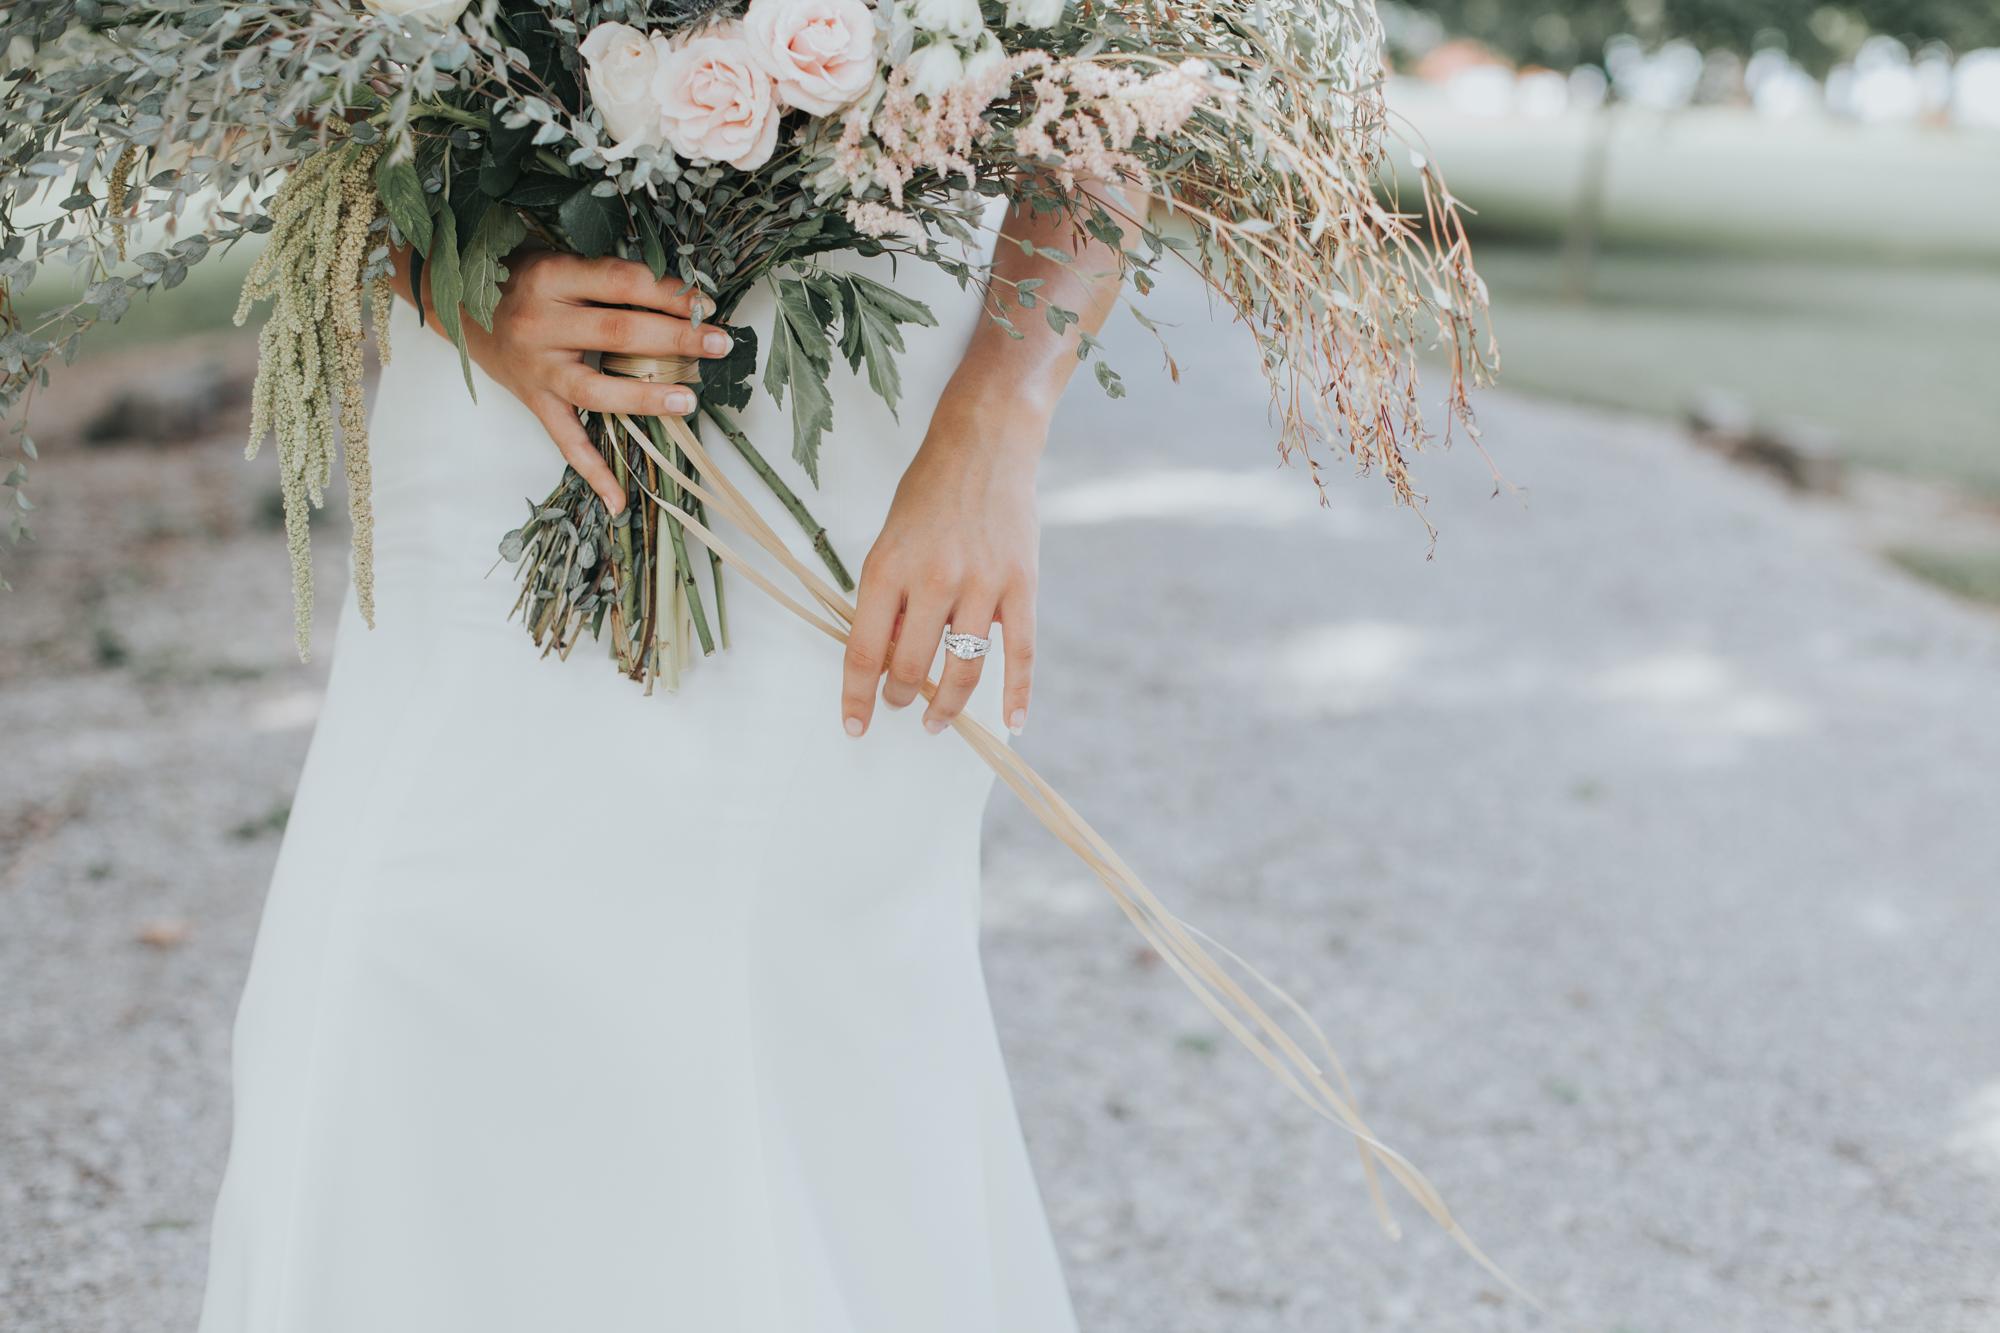 bridal-0017.jpg